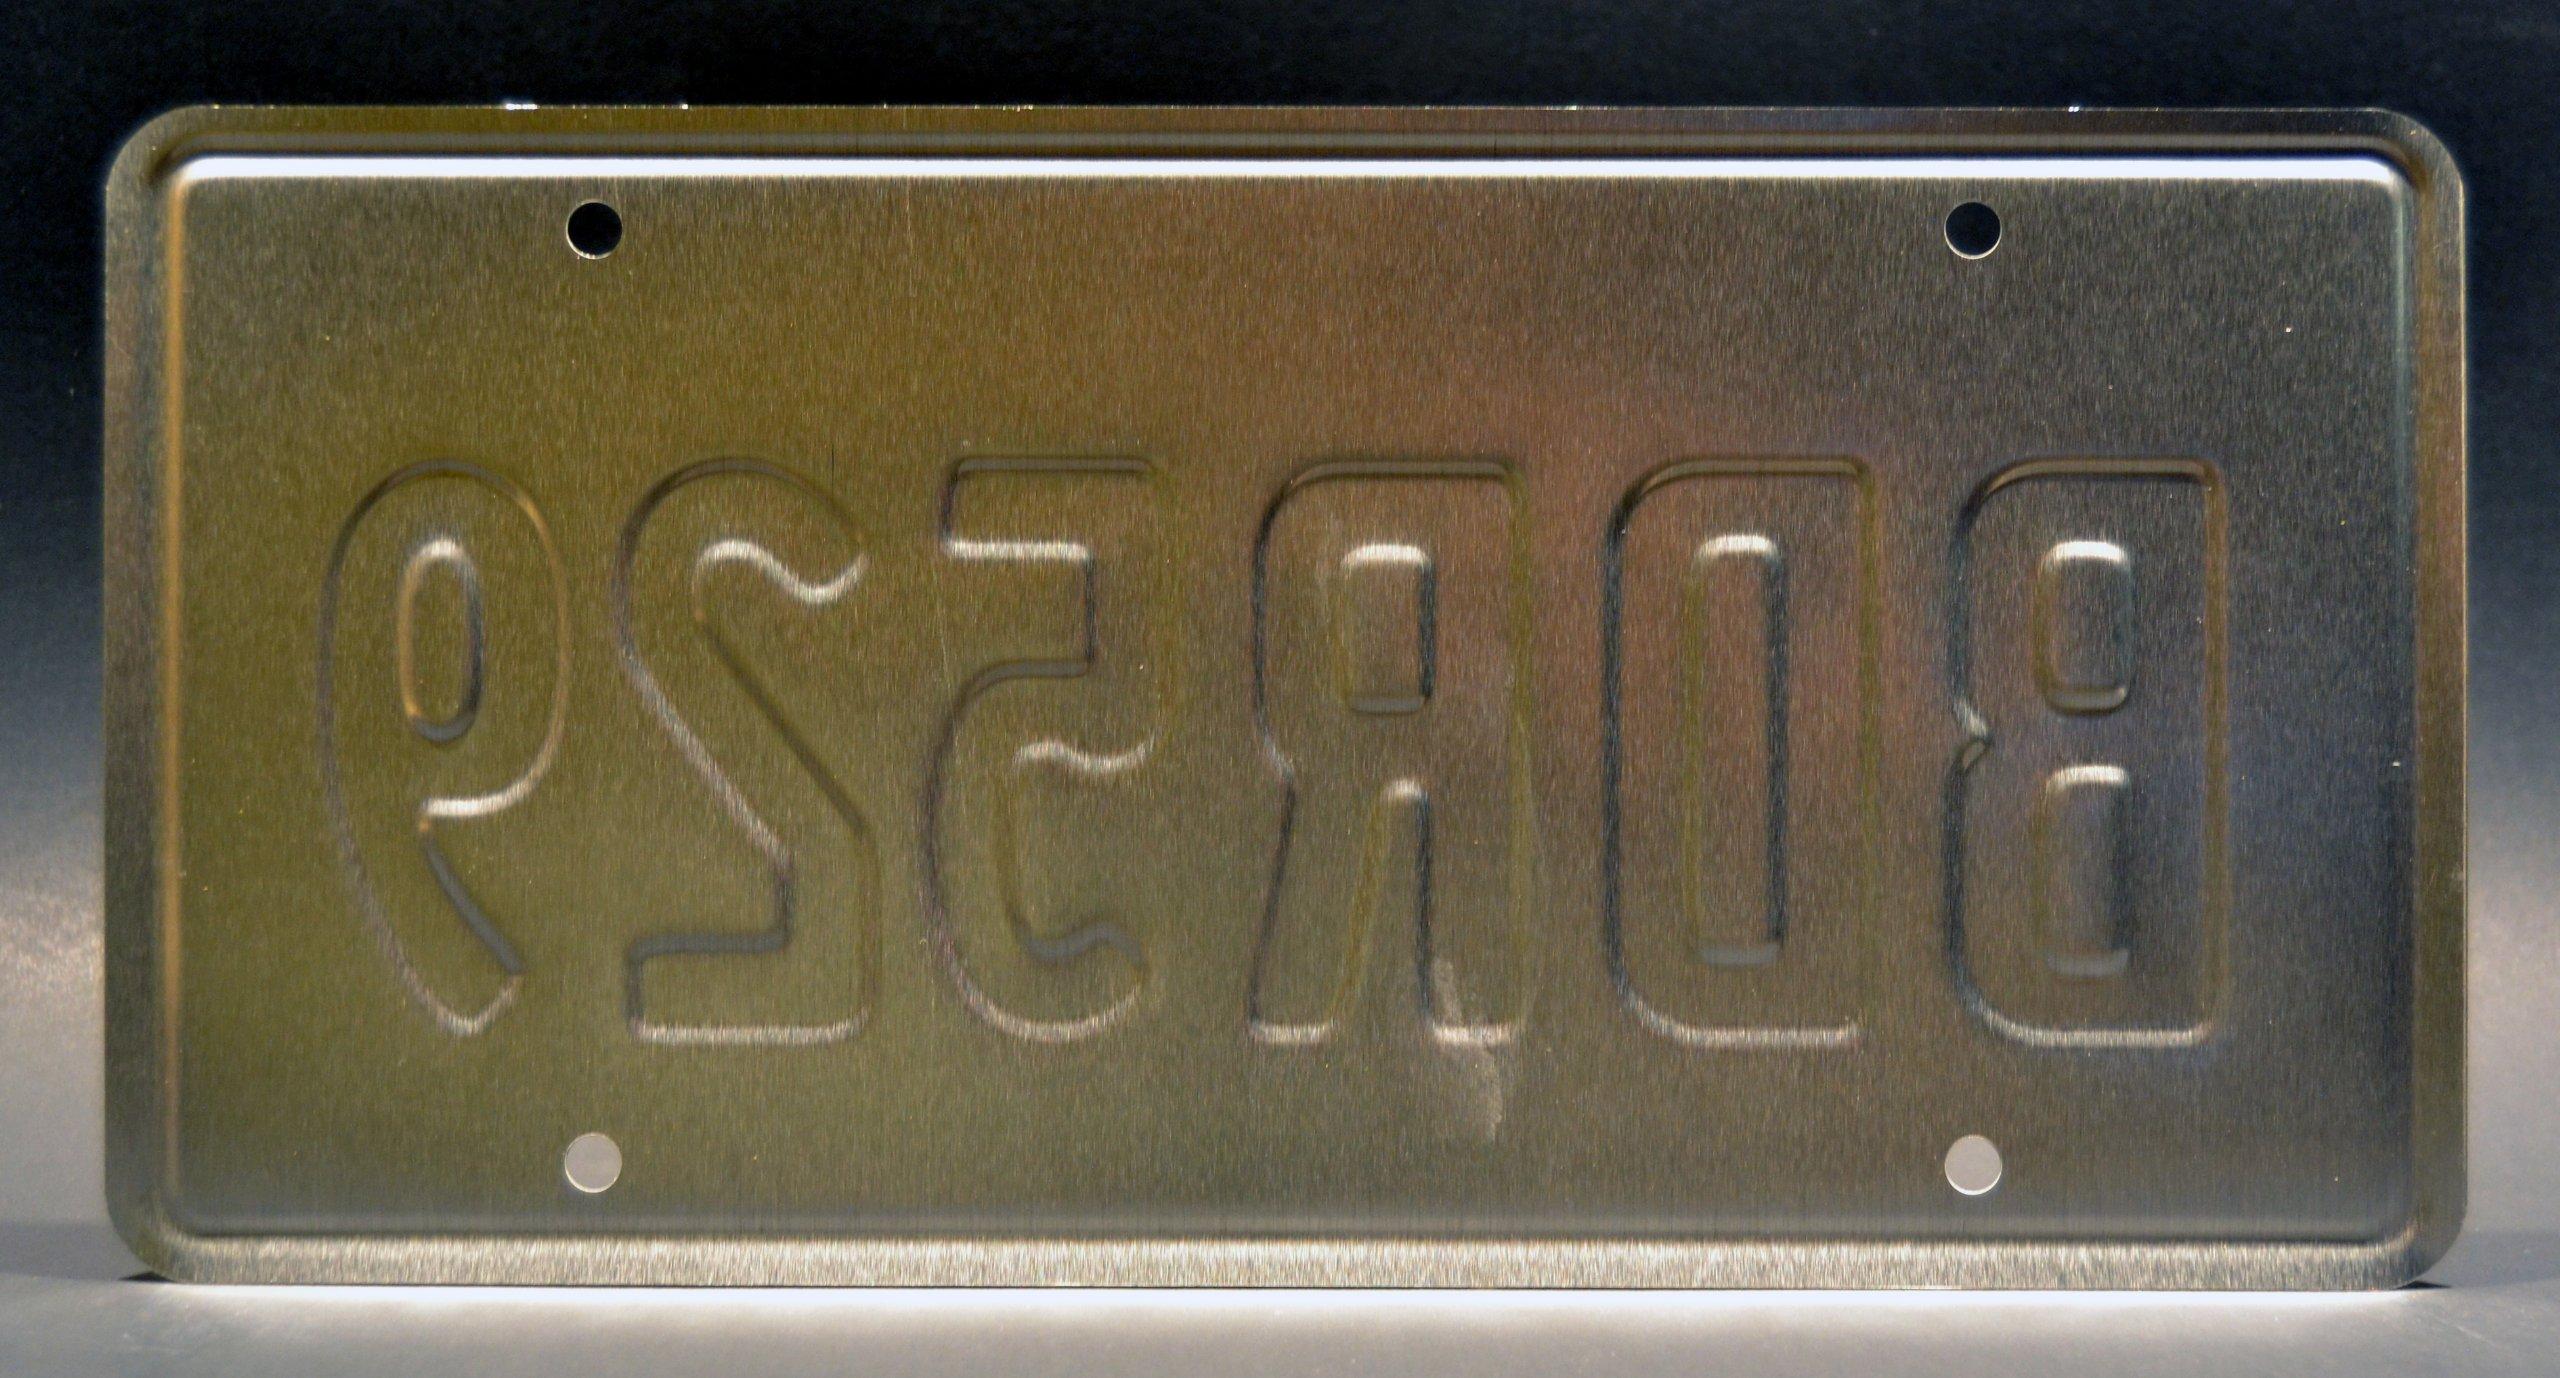 Celebrity Machines Targa in Metallo Stampata per Tom Cruise Porsche 928 N2Z 264